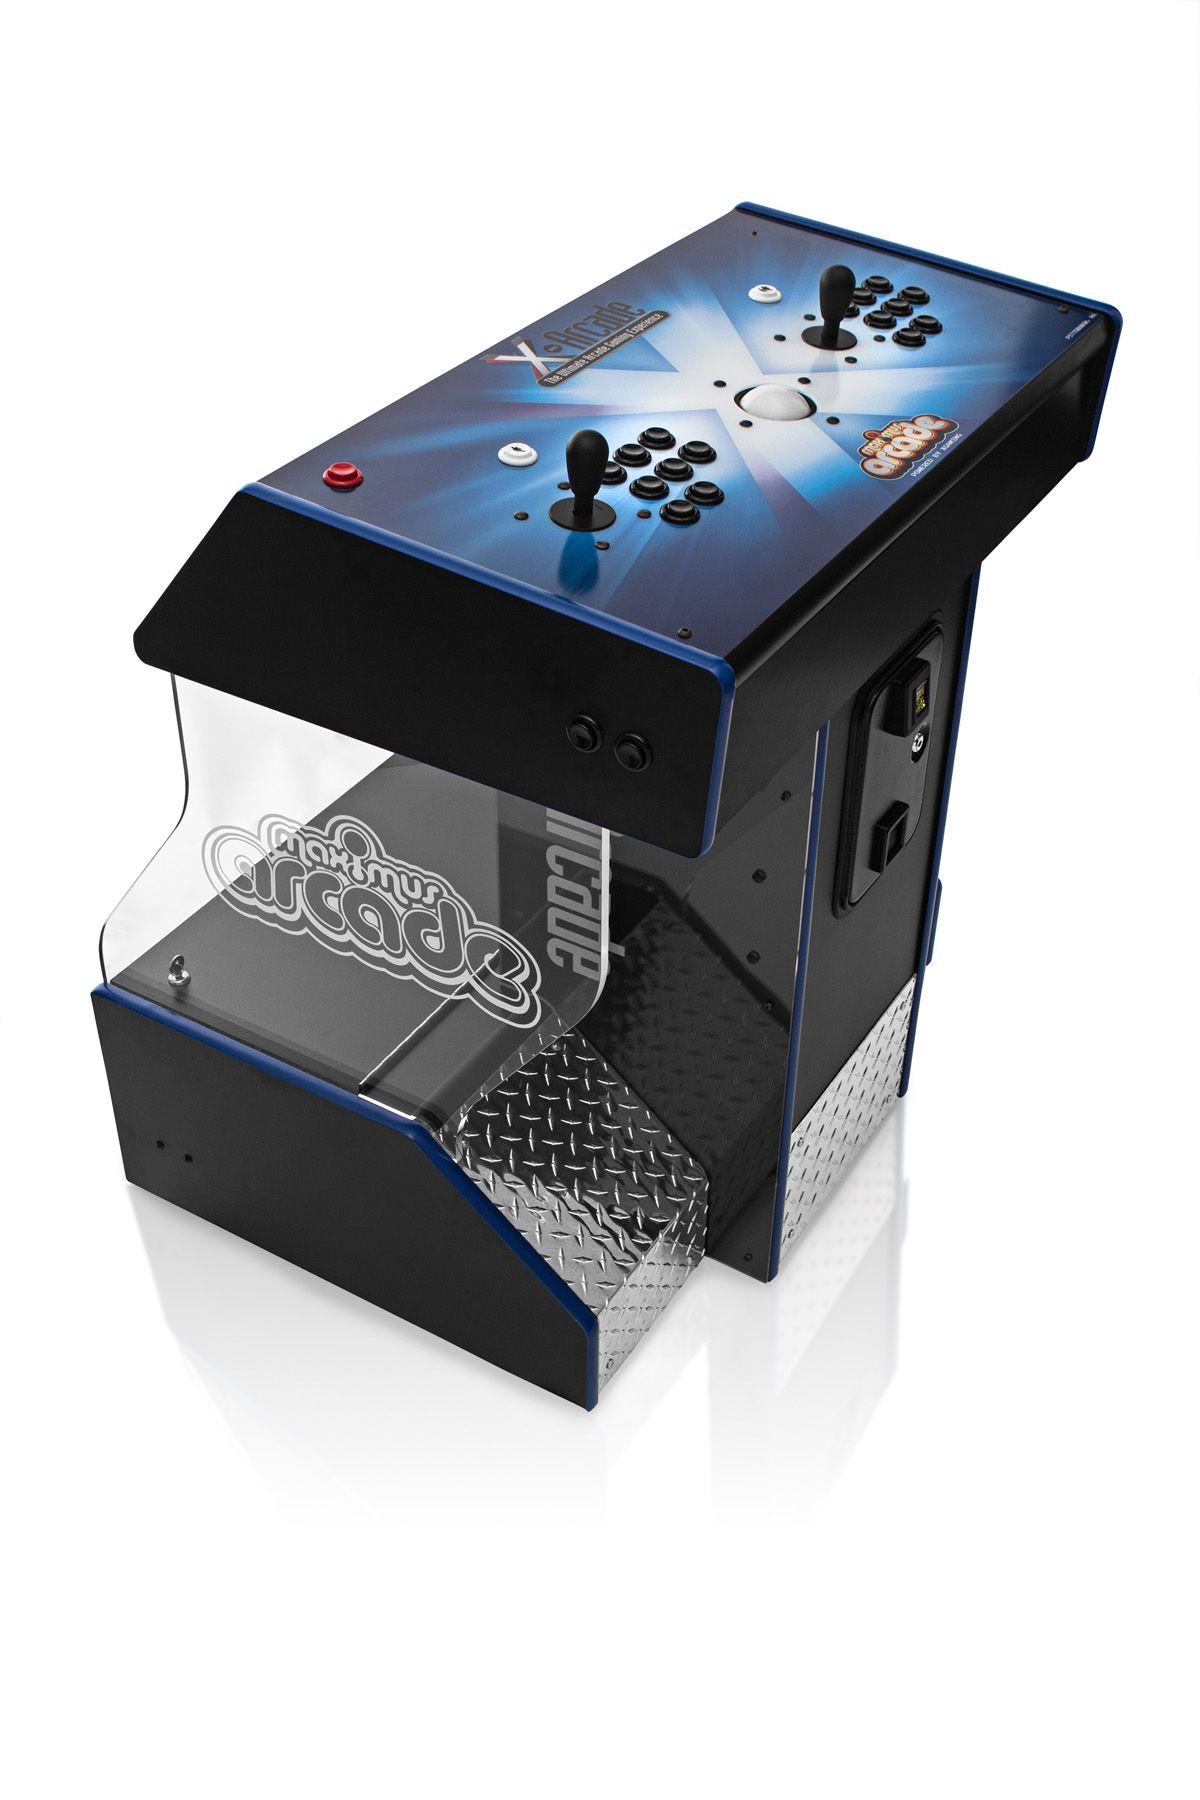 4 Player Arcade Cabinet Kit Simple Lightweight Custom Arcade Cabinet The Blondicade Via